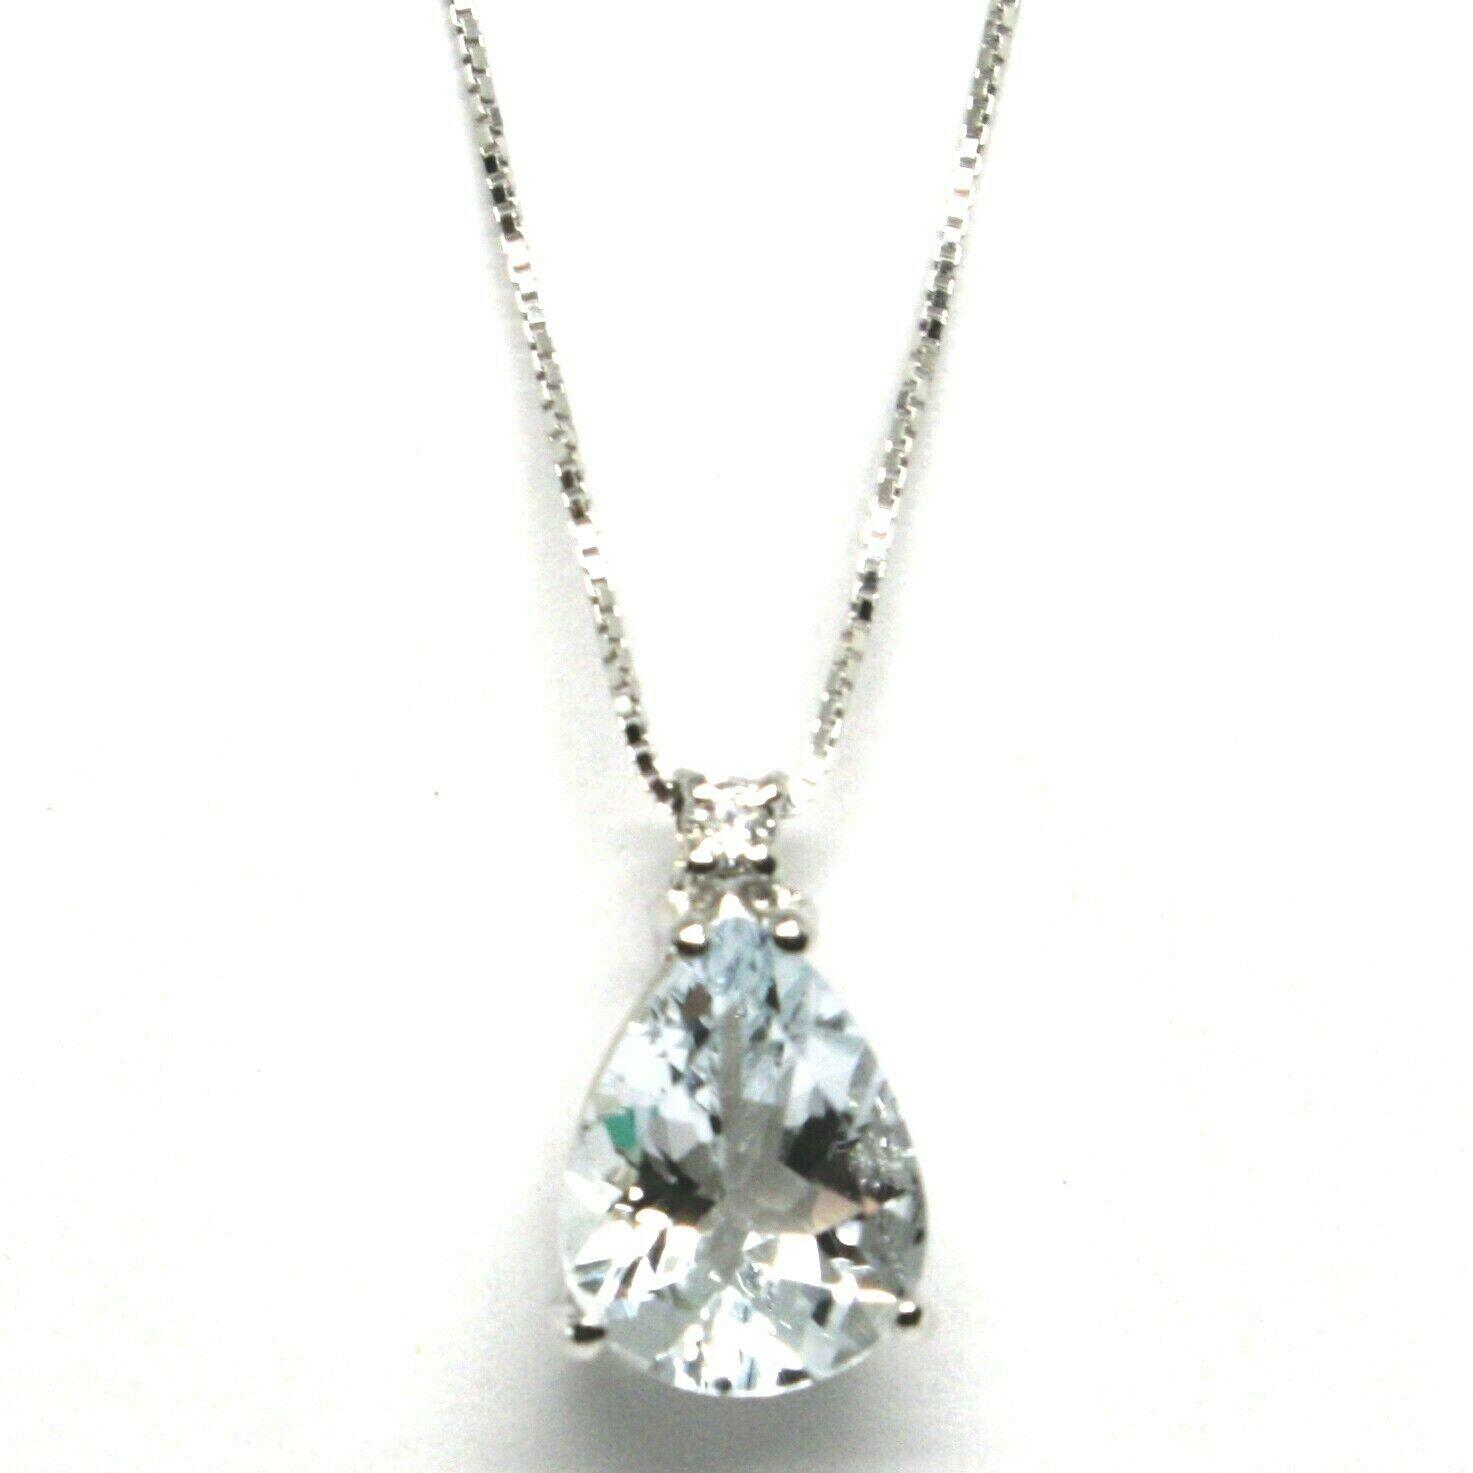 Necklace with White Gold Pendant 750 18K, Aquamarine Cut Drop, Diamond